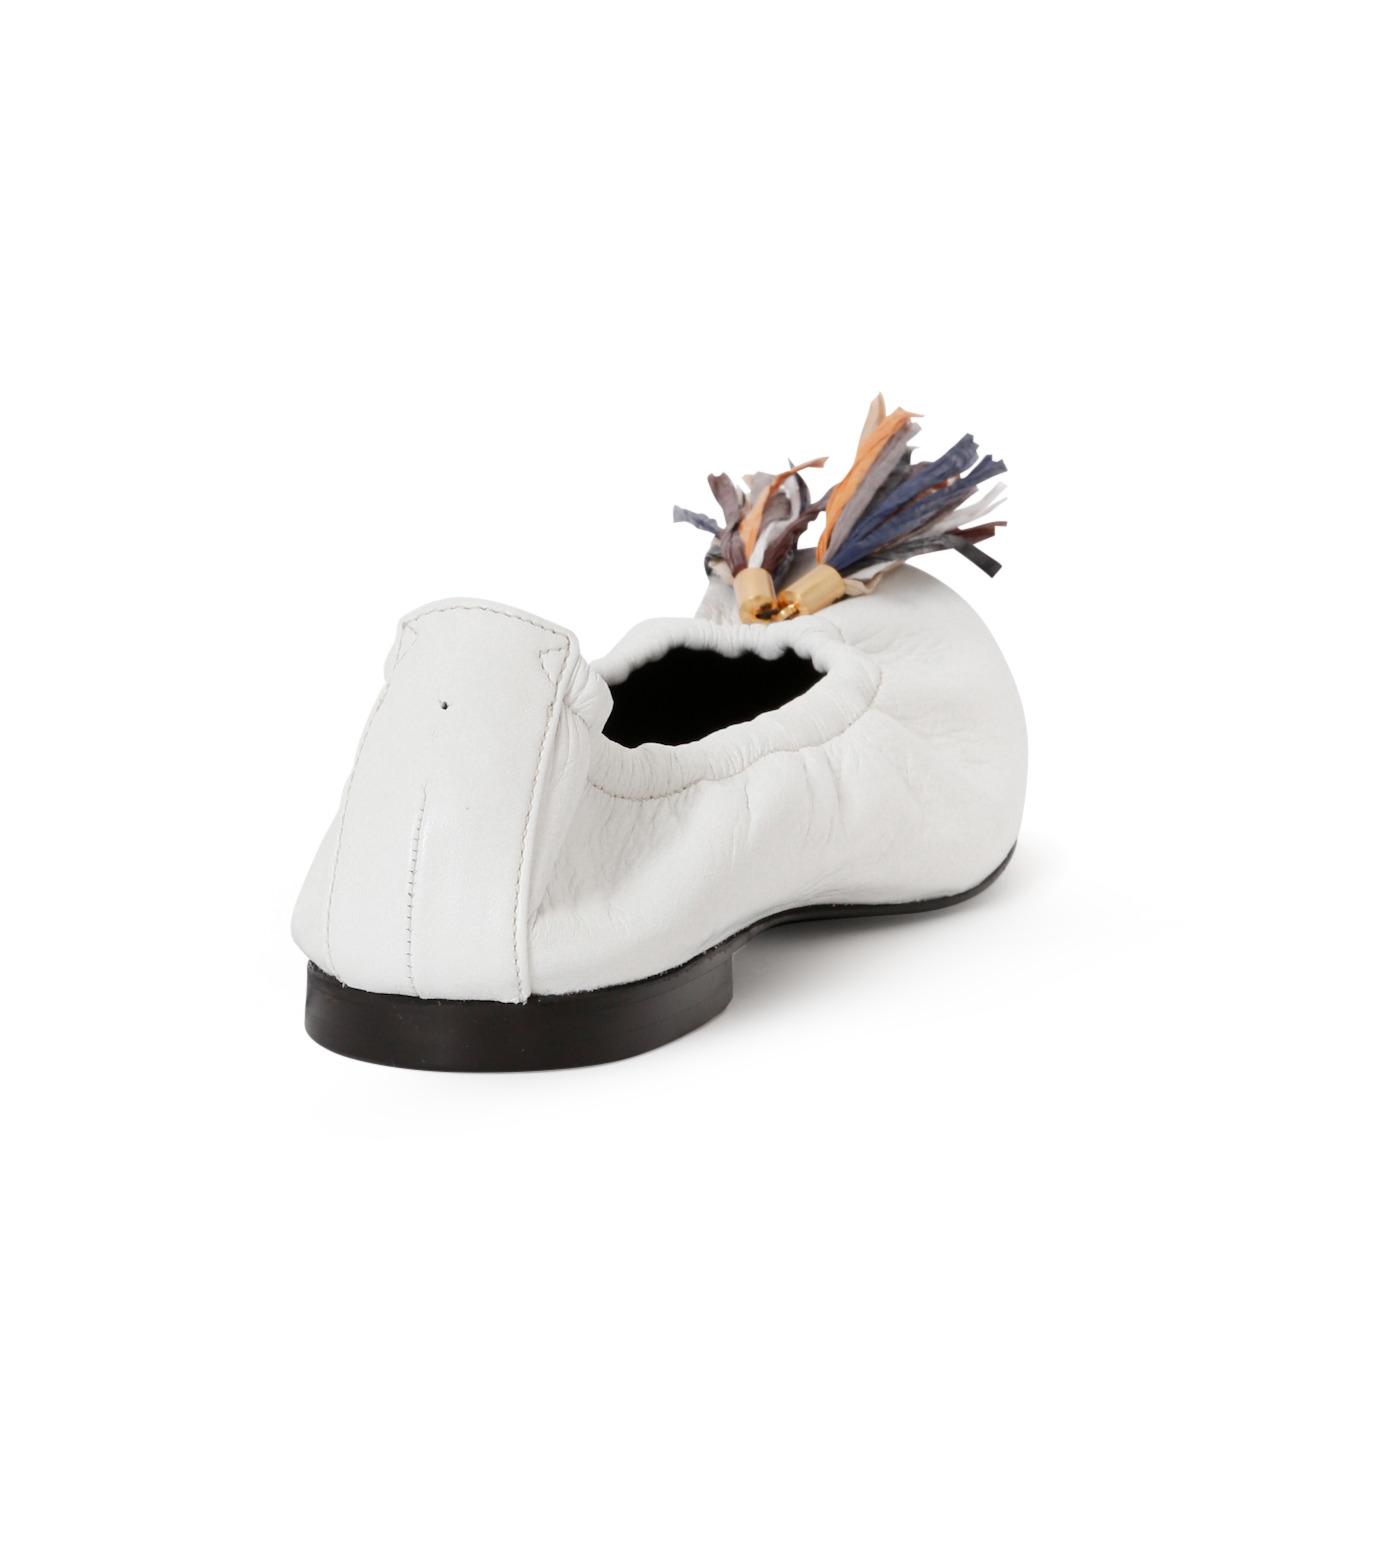 PIPPICHIC(ピッピシック)のballet shoes-WHITE(シューズ/shoes)-PP16BALLET19-4 拡大詳細画像3